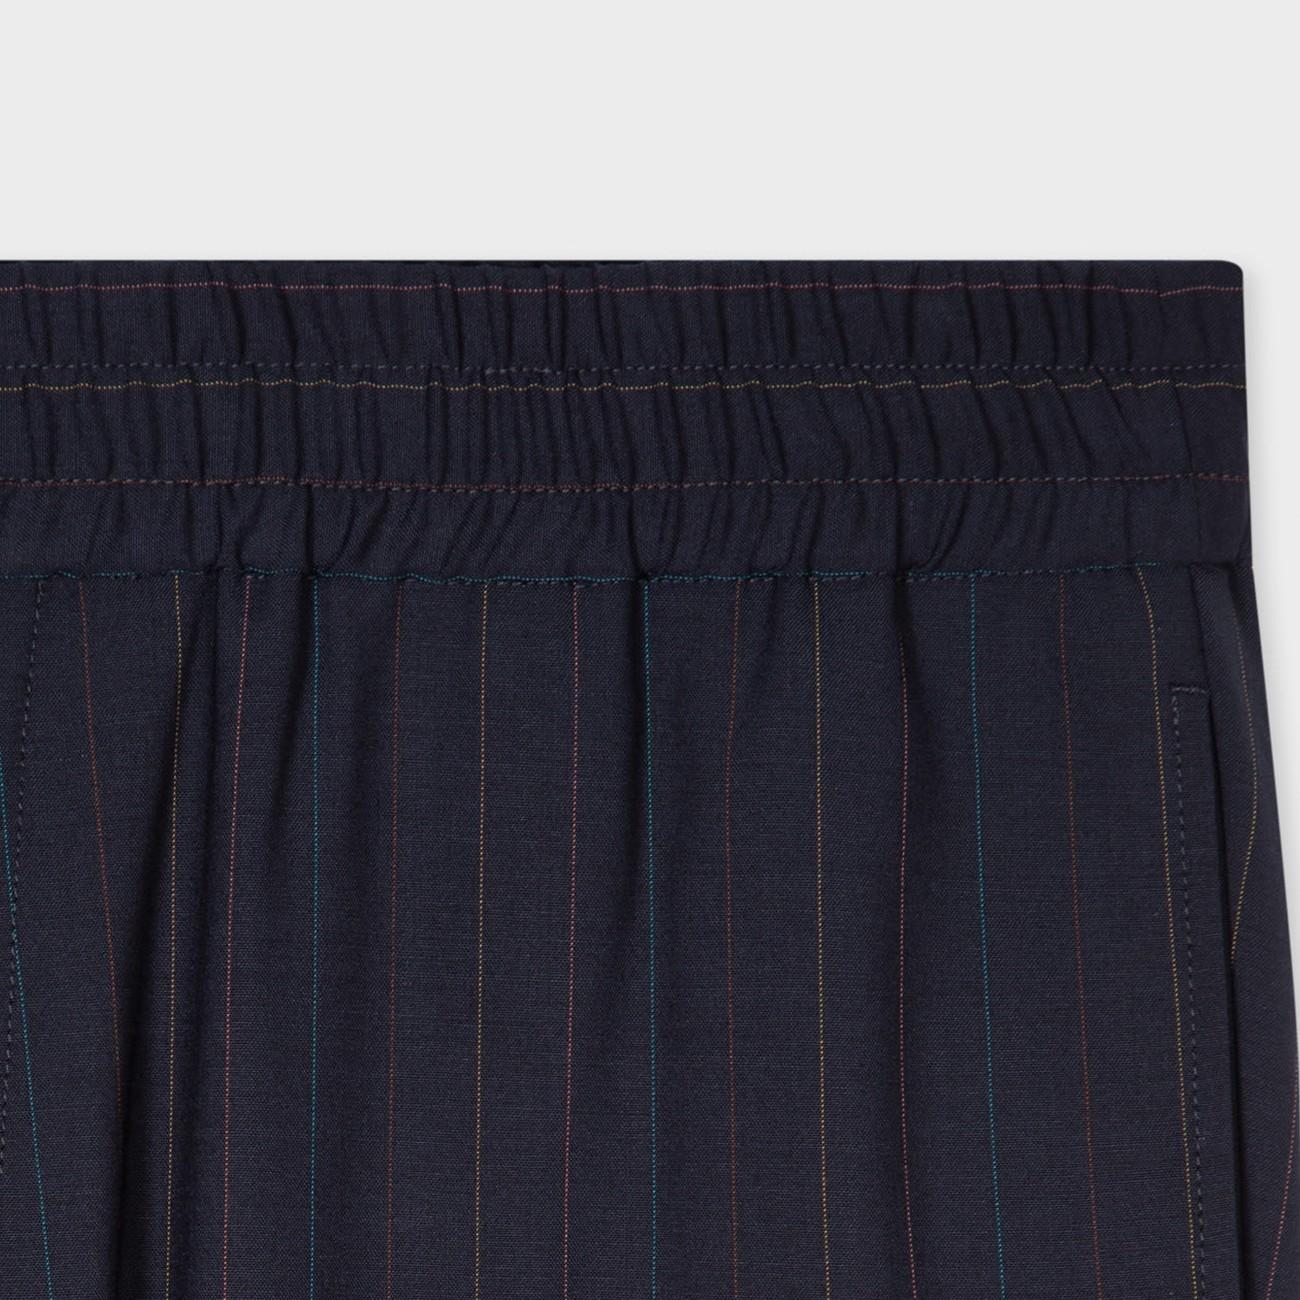 NAVY BLUE WOOL PANTS WITH DIPLOMATIC STRIPE PAUL SMITH  M1R-629U-F01336-49